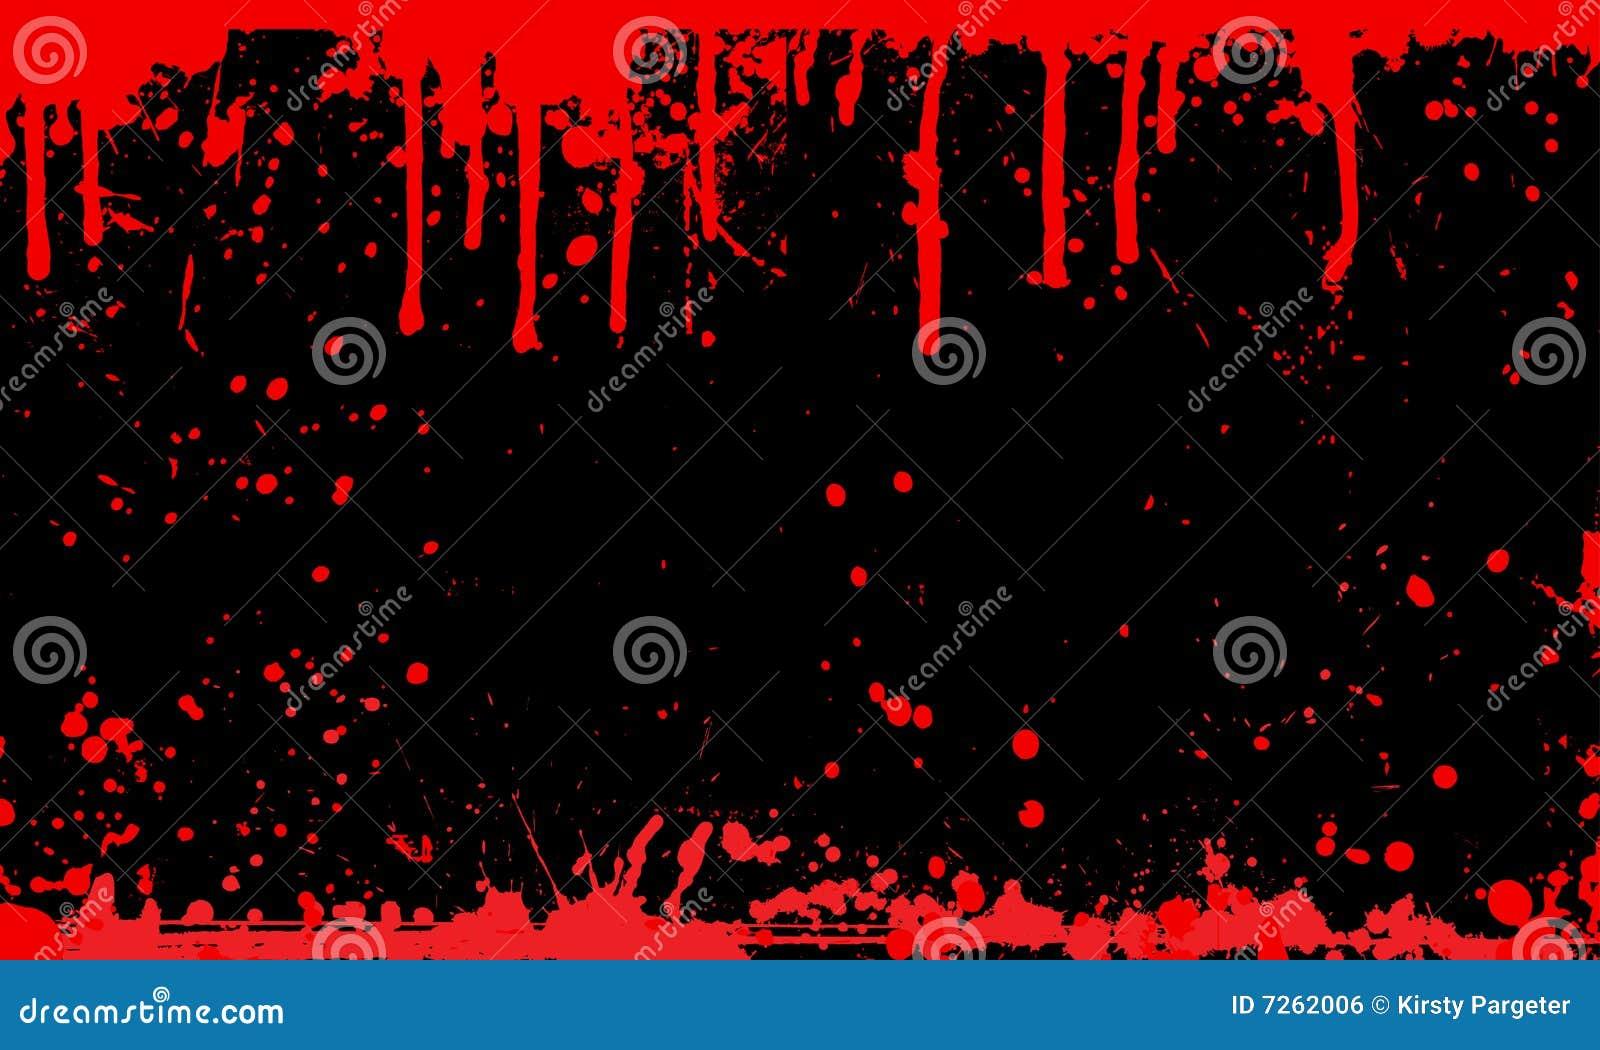 blood splat background stock vector illustration of